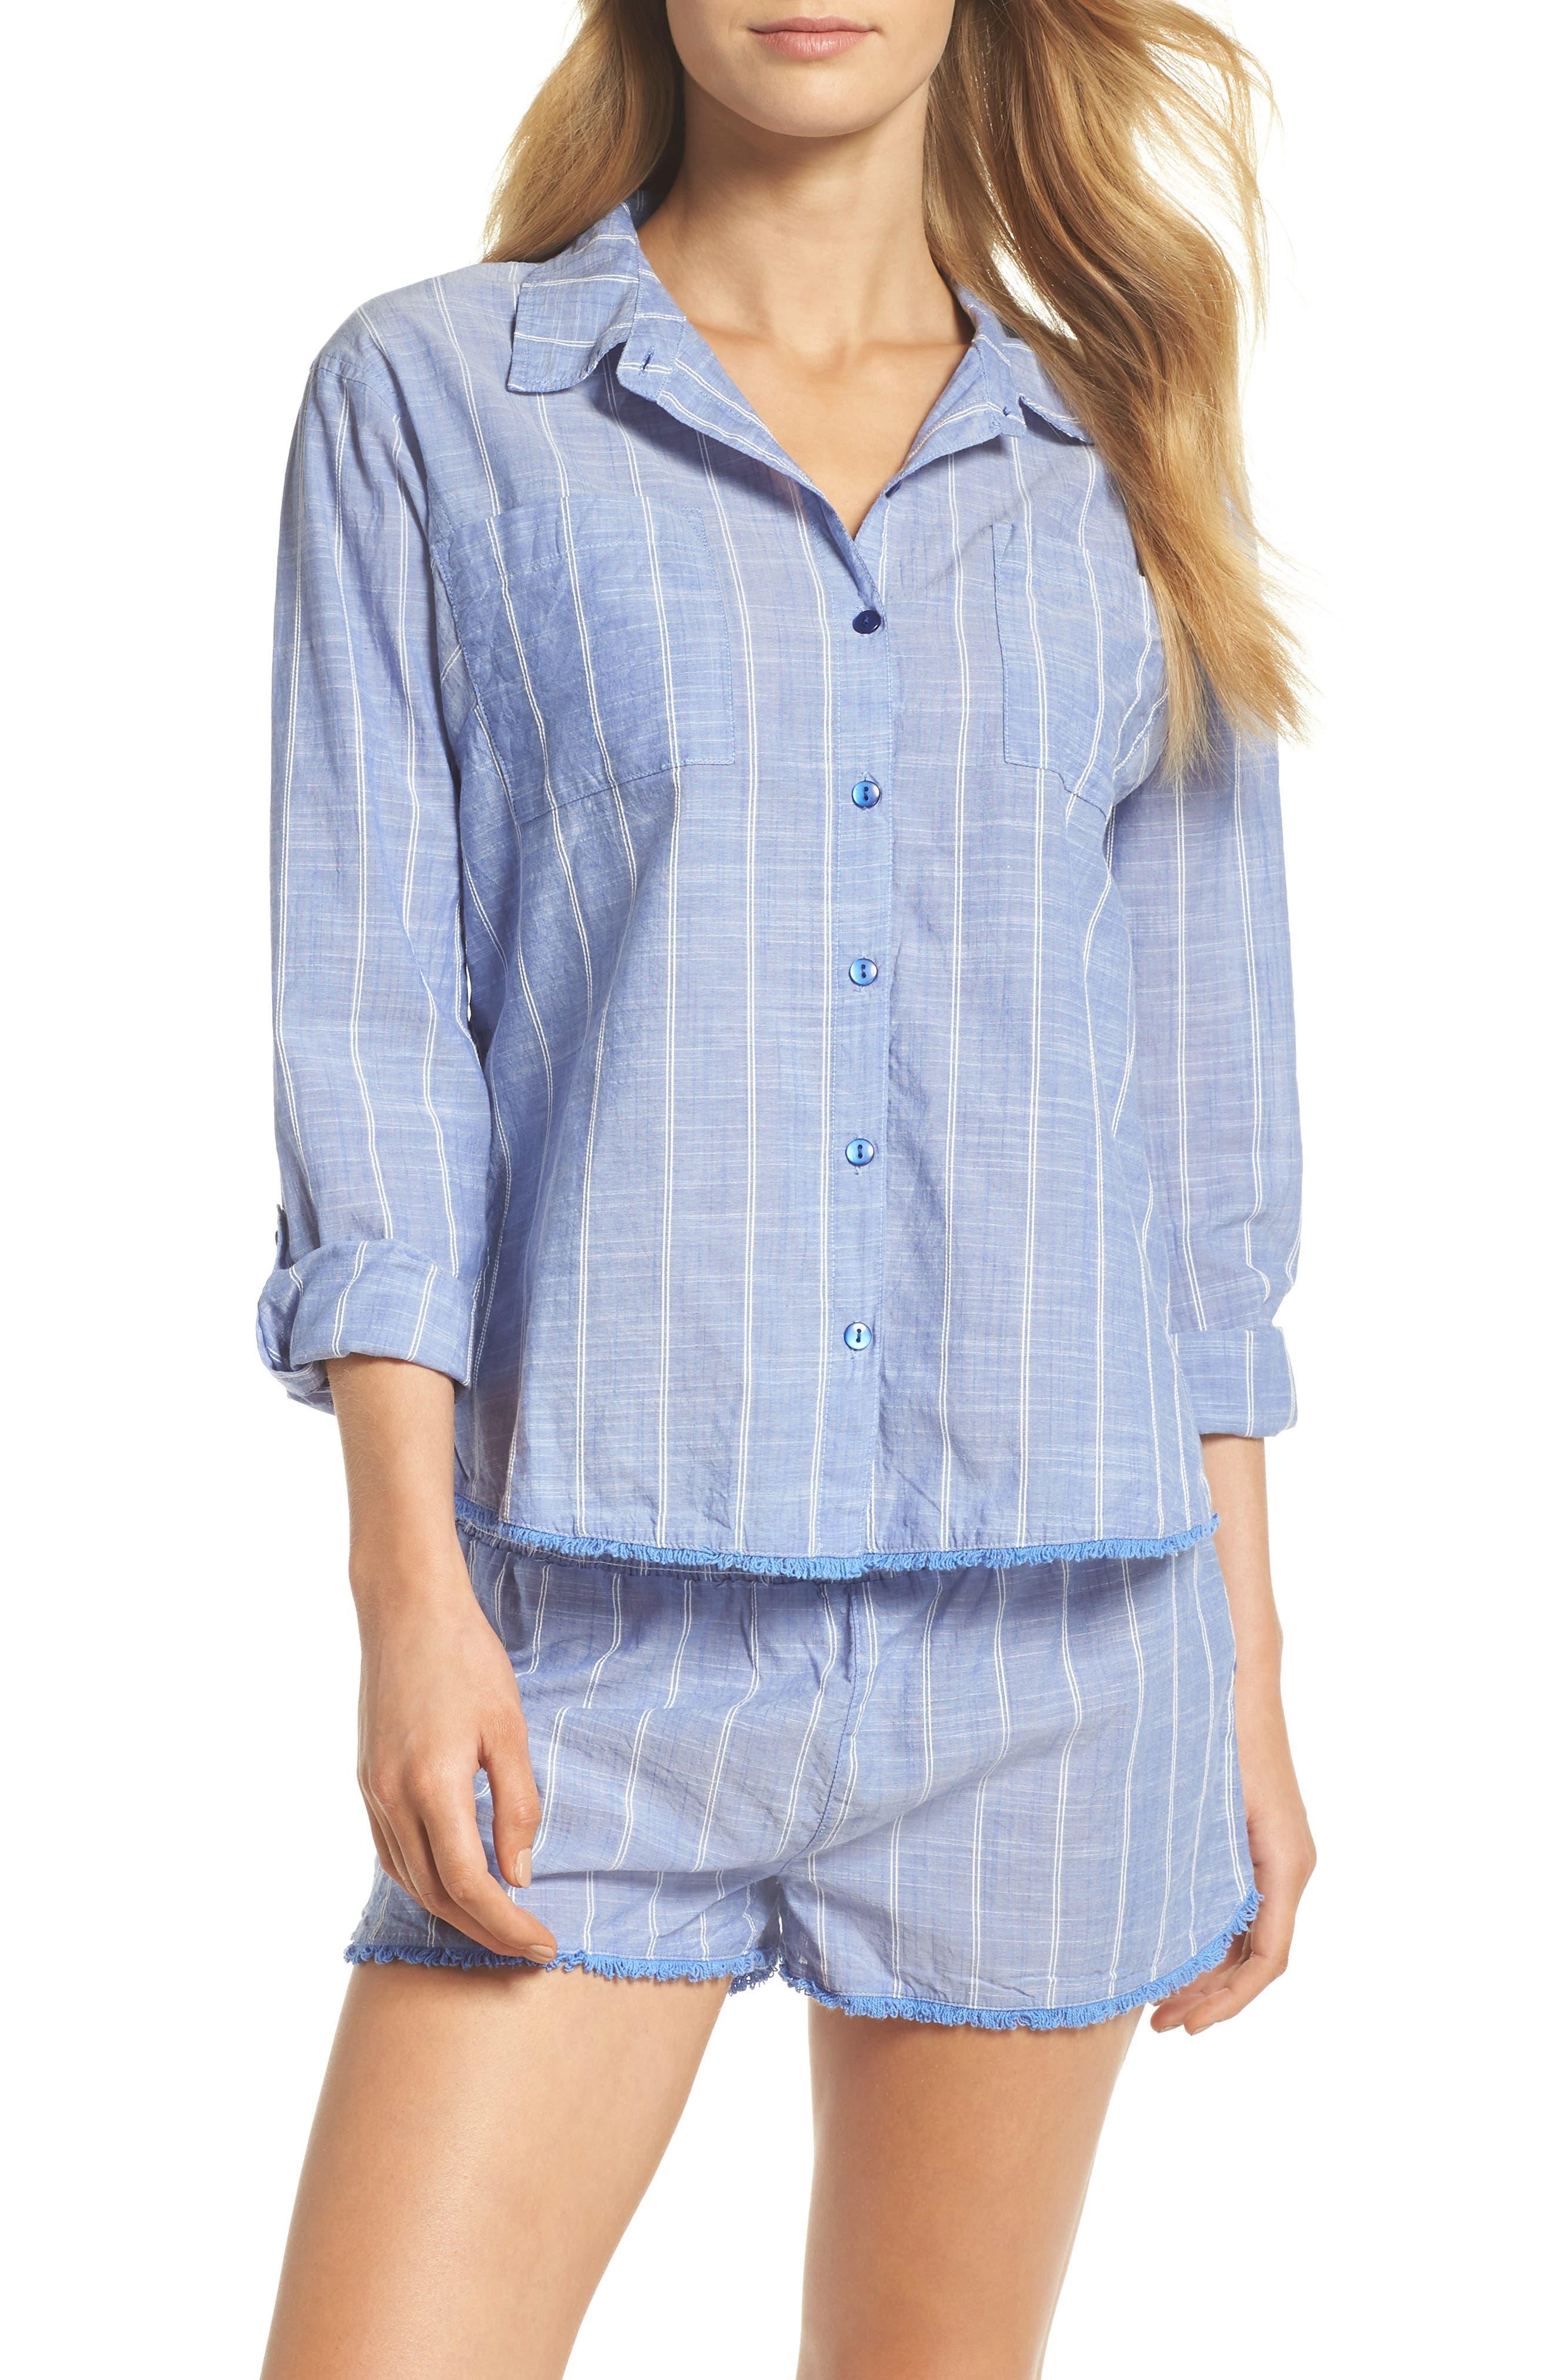 Stripe Short Pajamas,                             Main thumbnail 1, color,                             Blue